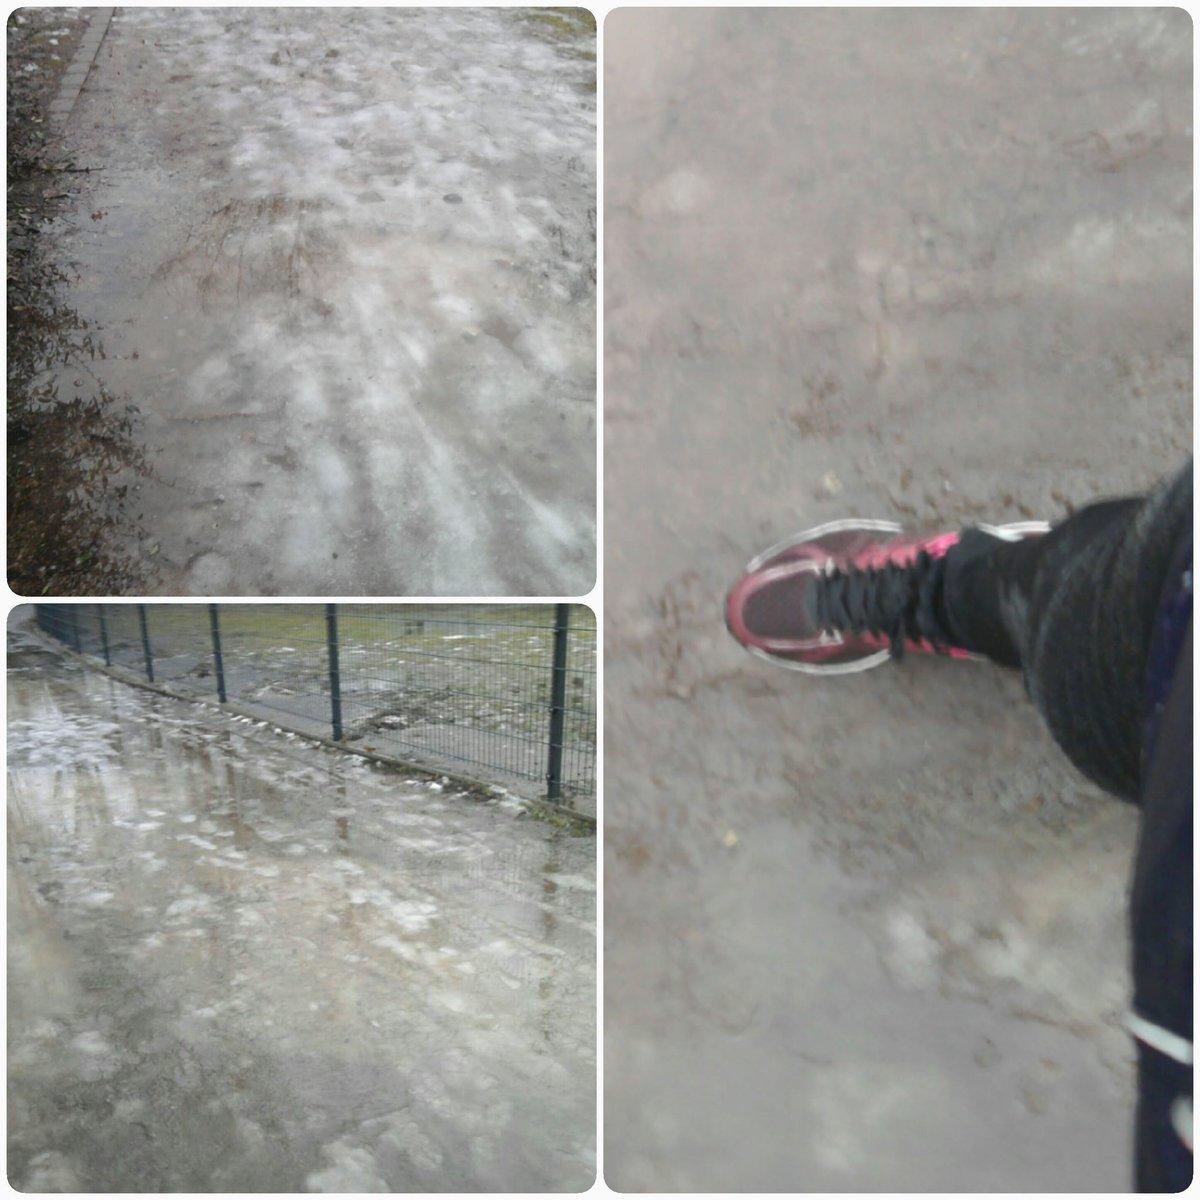 Joggen bei regen